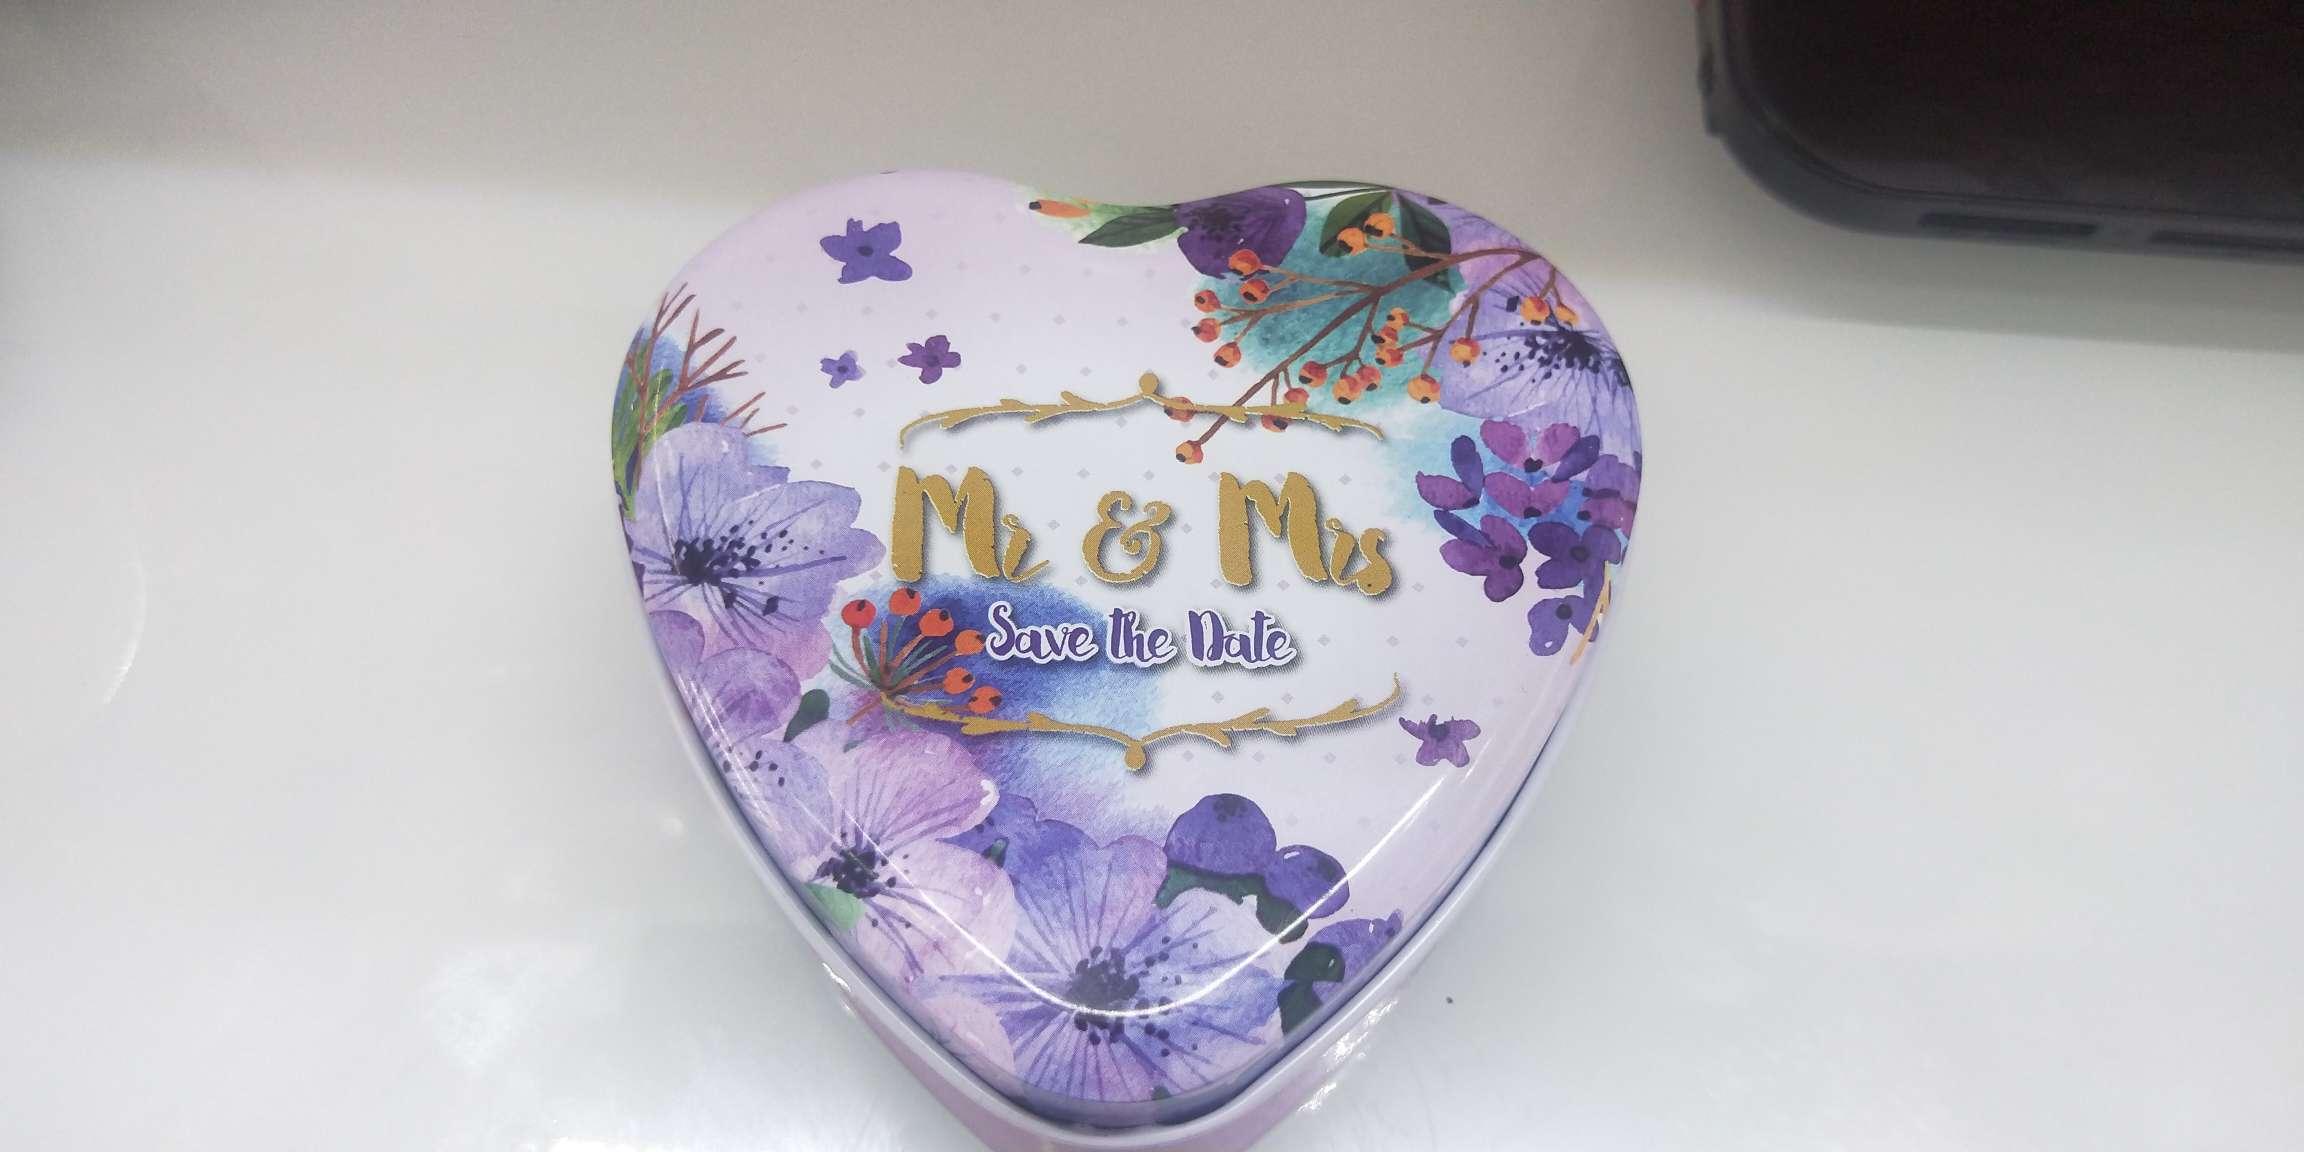 10*9.5*4.5cm 精美爱心形包装铁盒 礼品盒Z-27